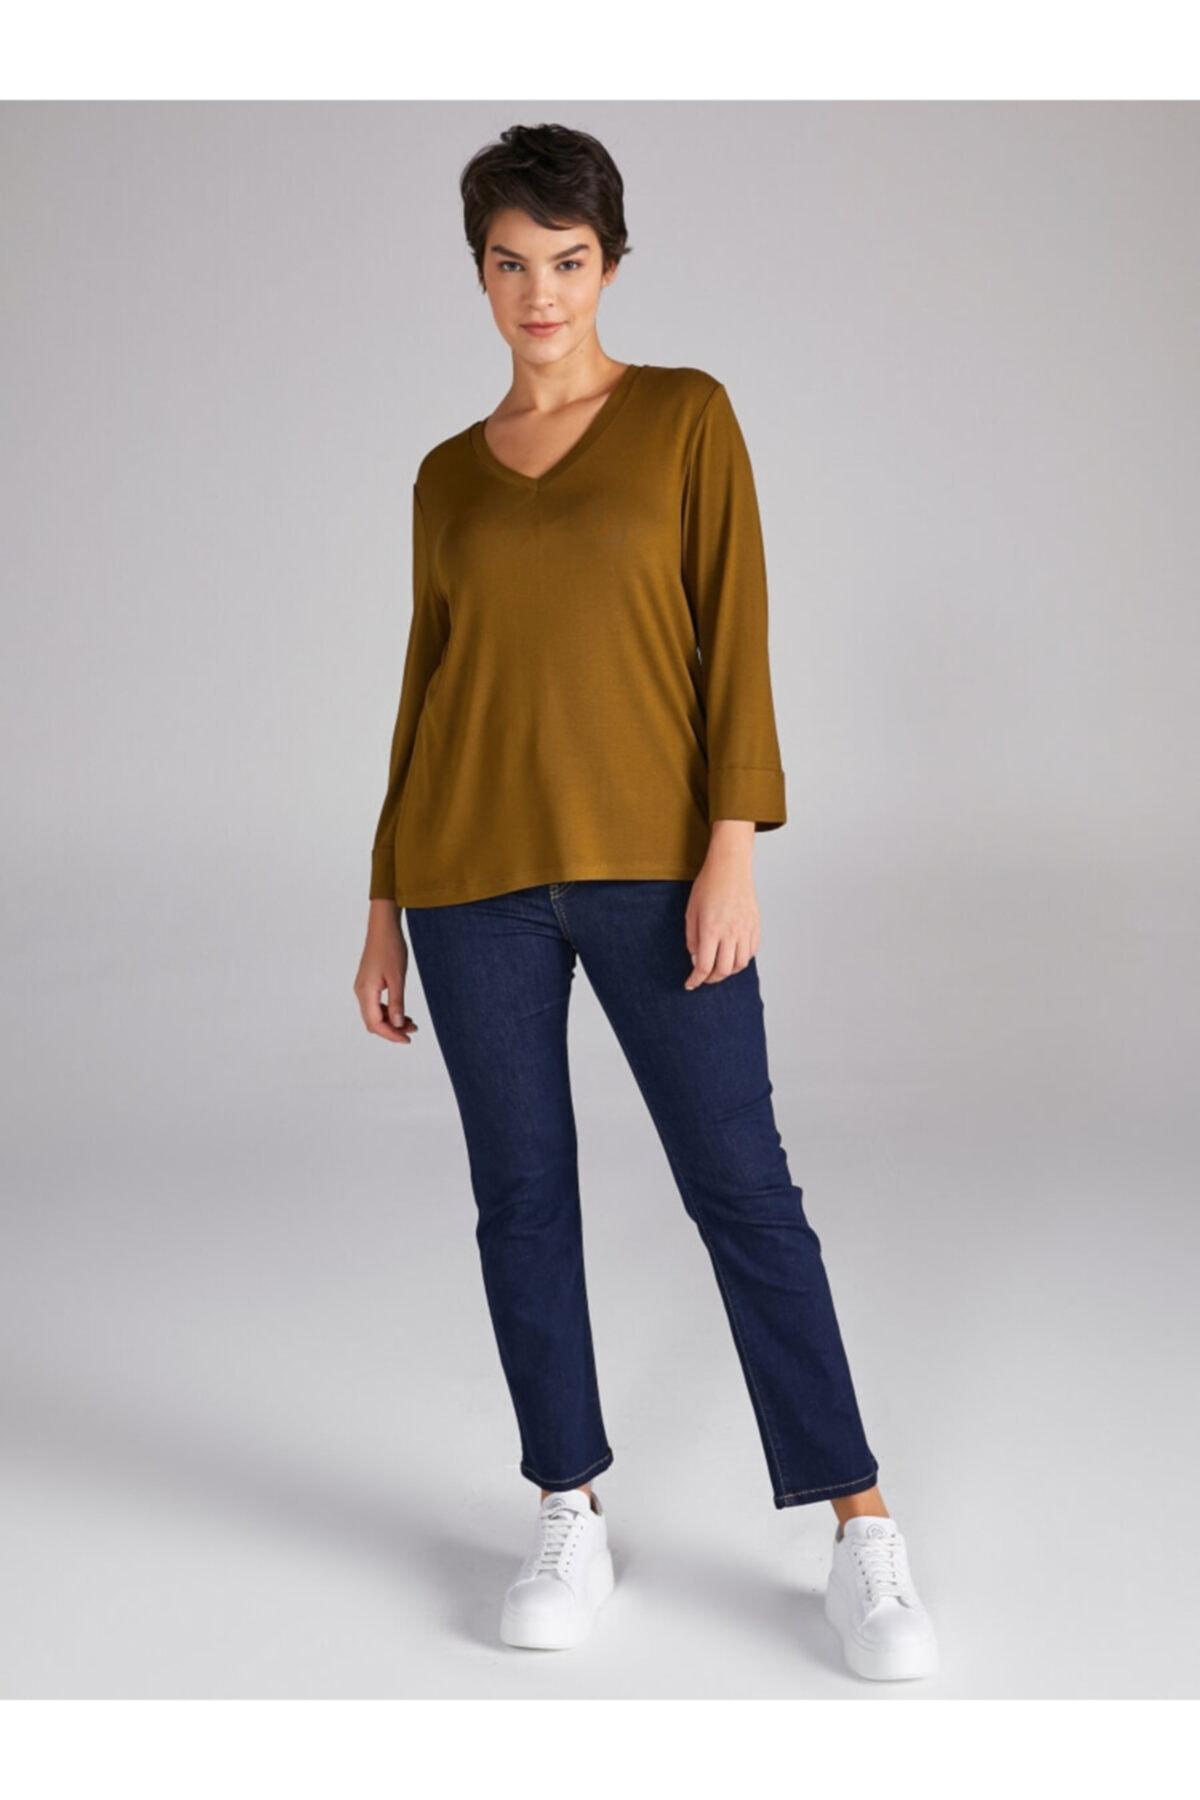 Faik Sönmez Kadın Yeşil V Yaka Truvakar Kol T-shirt 2